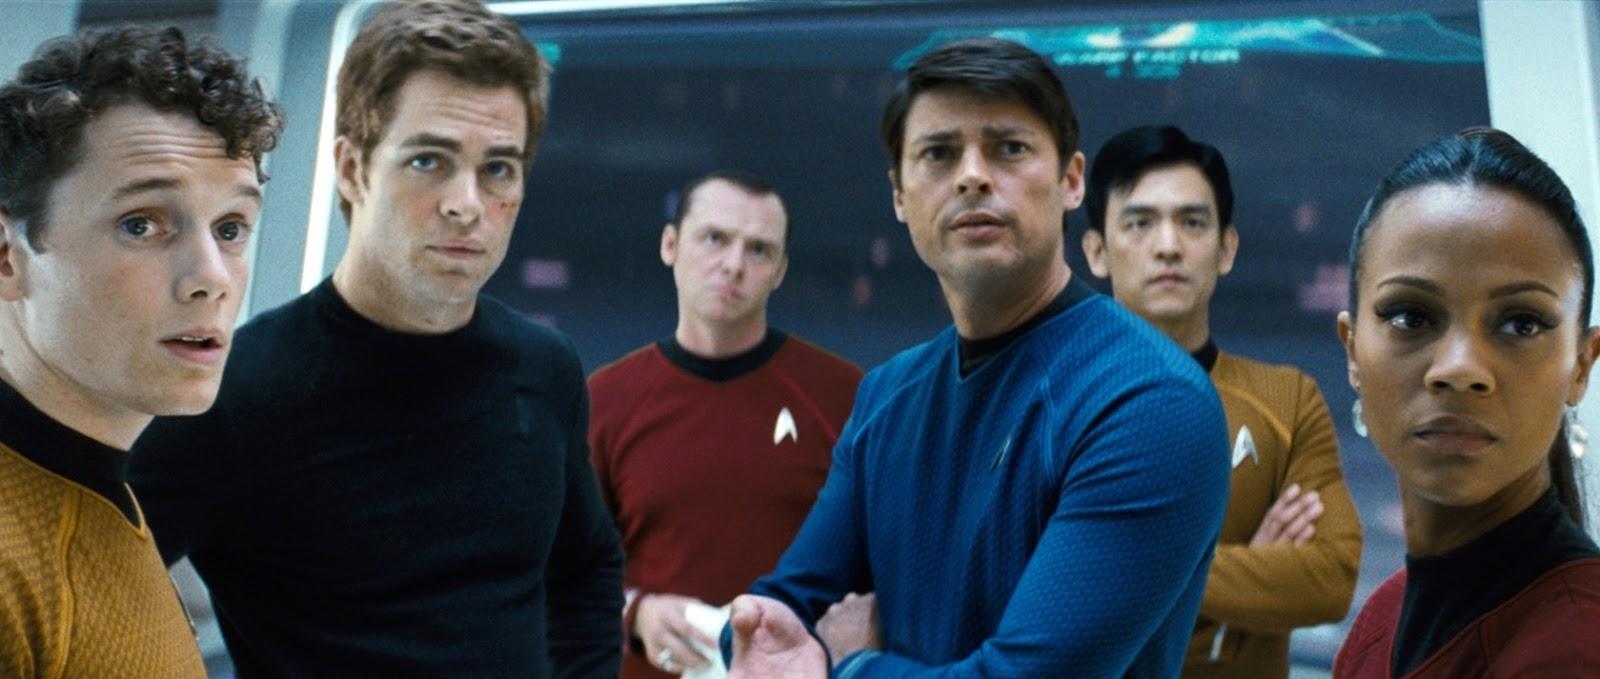 The Enterprise crew on the bridge